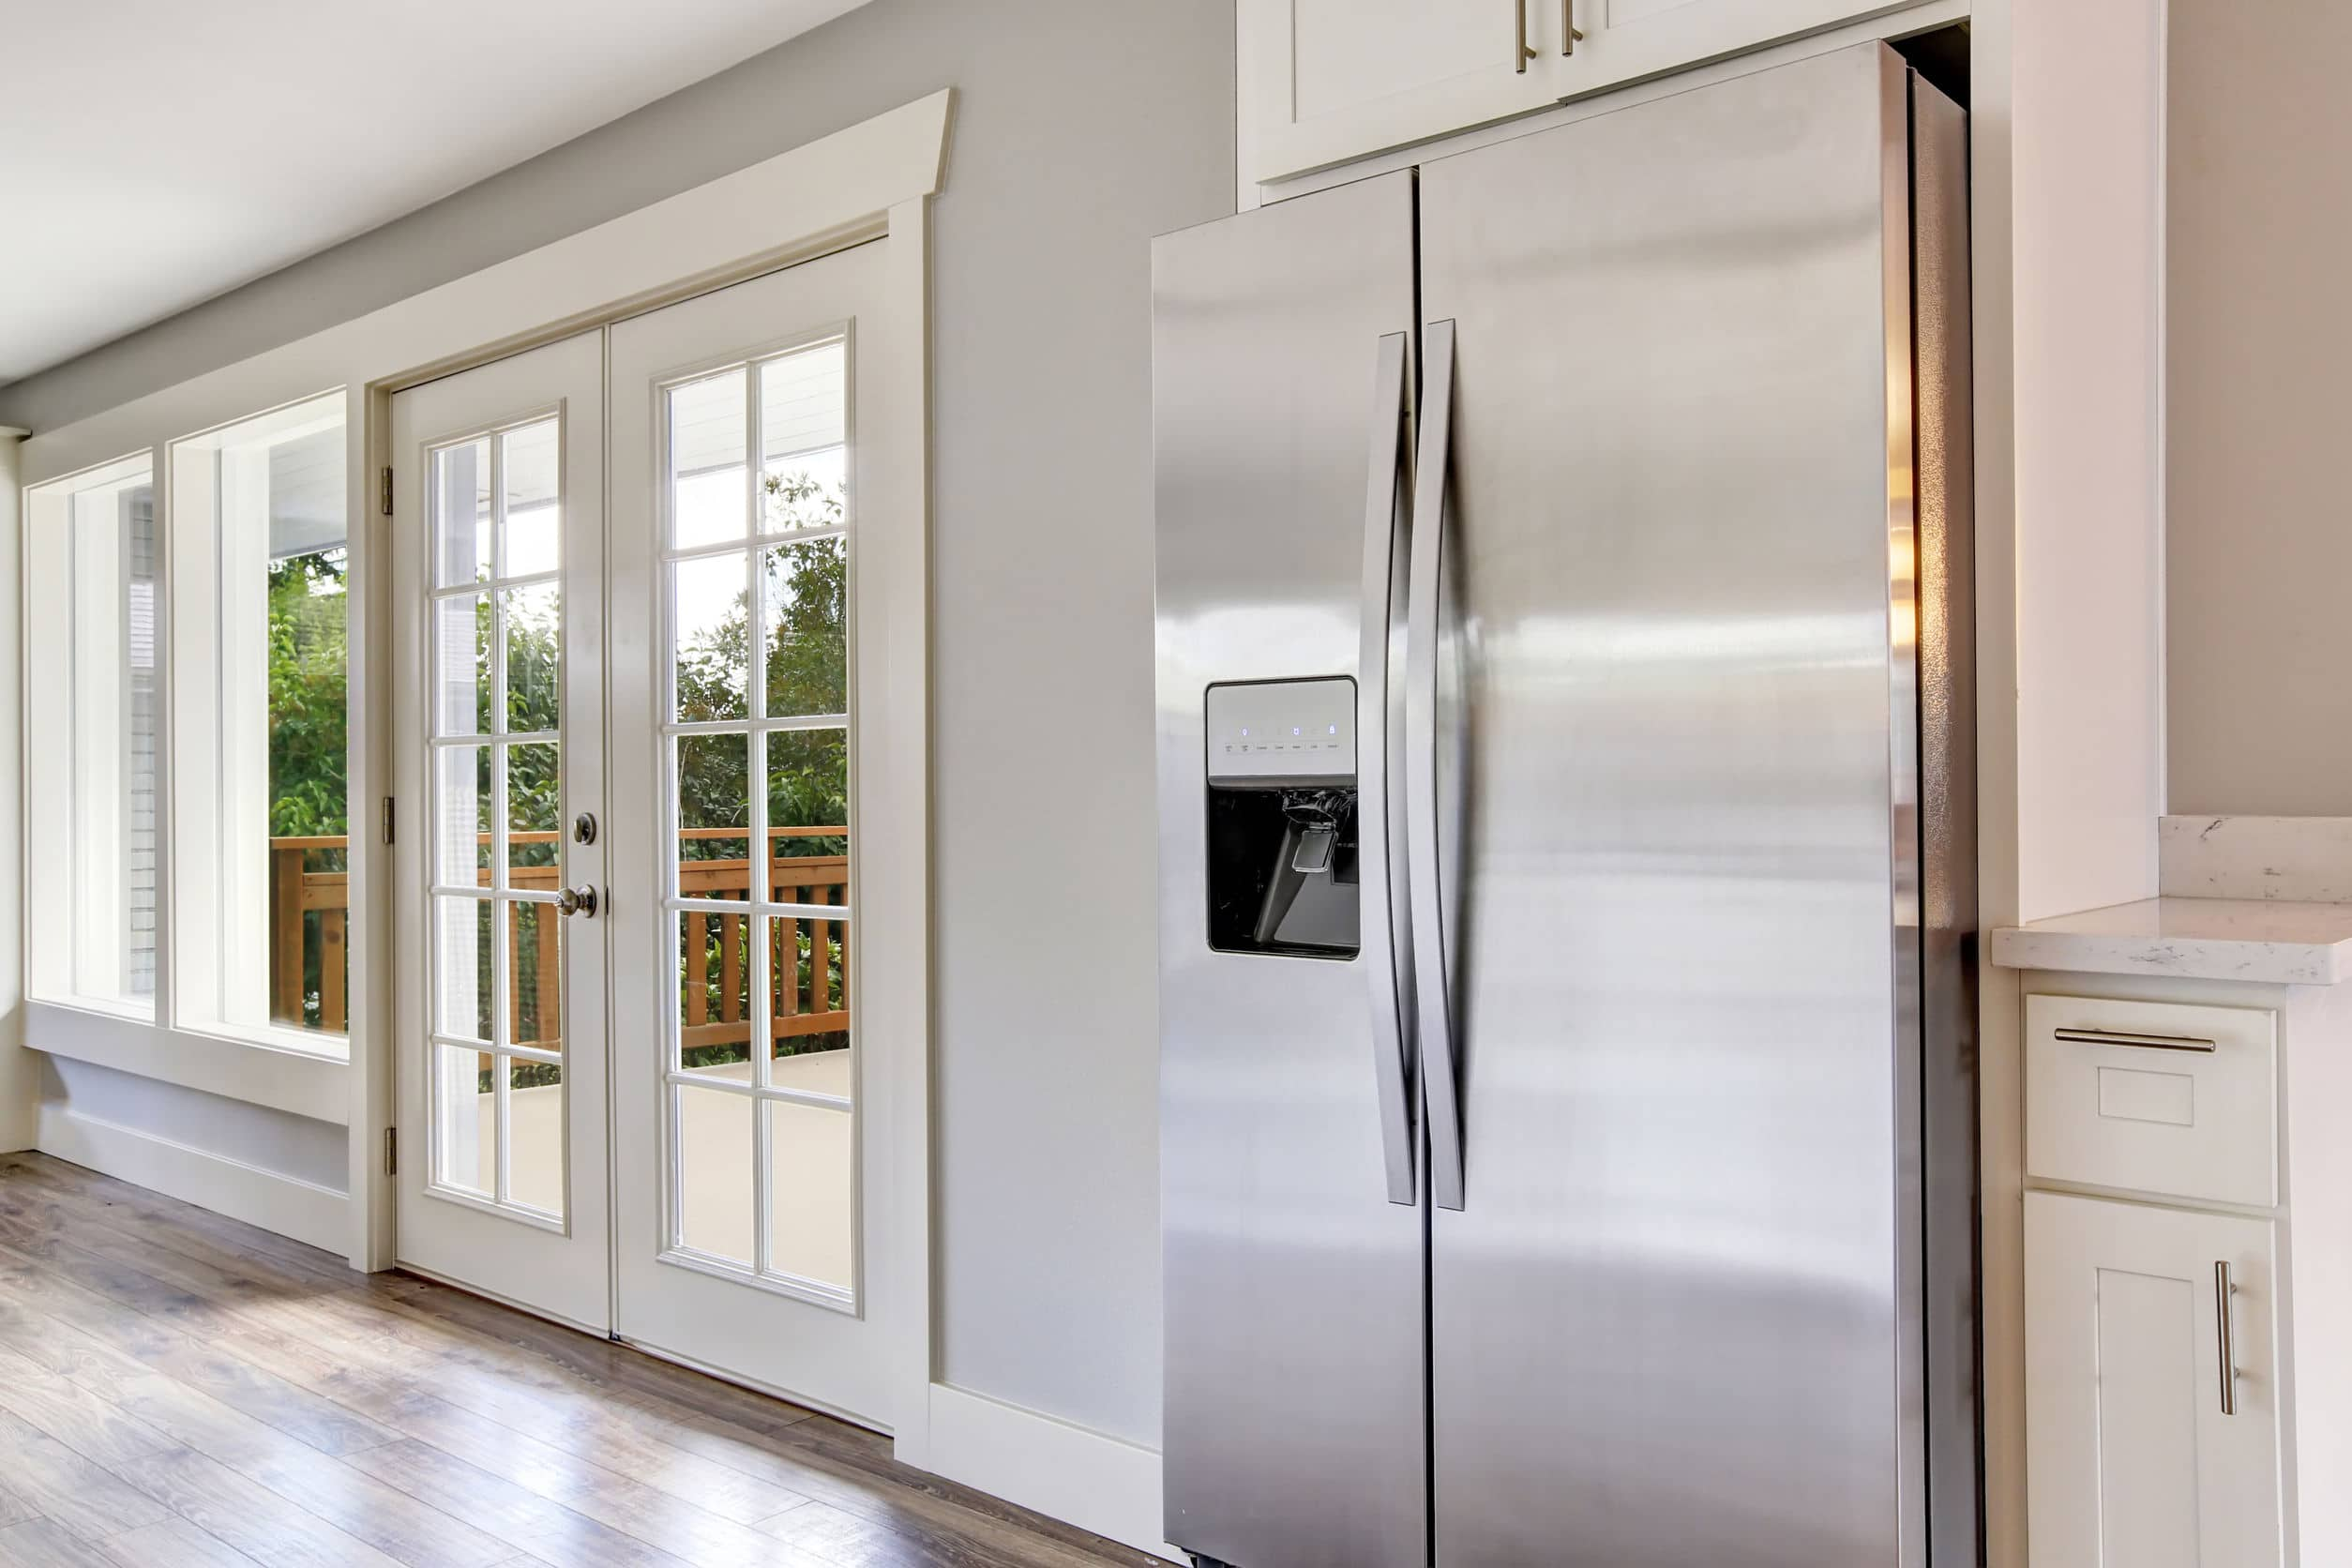 Refrigerator in a home kitchen